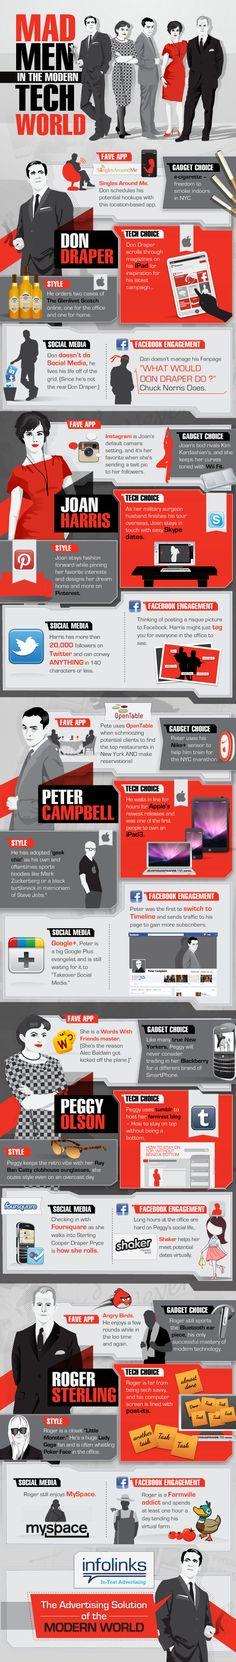 Mad Men Tech World